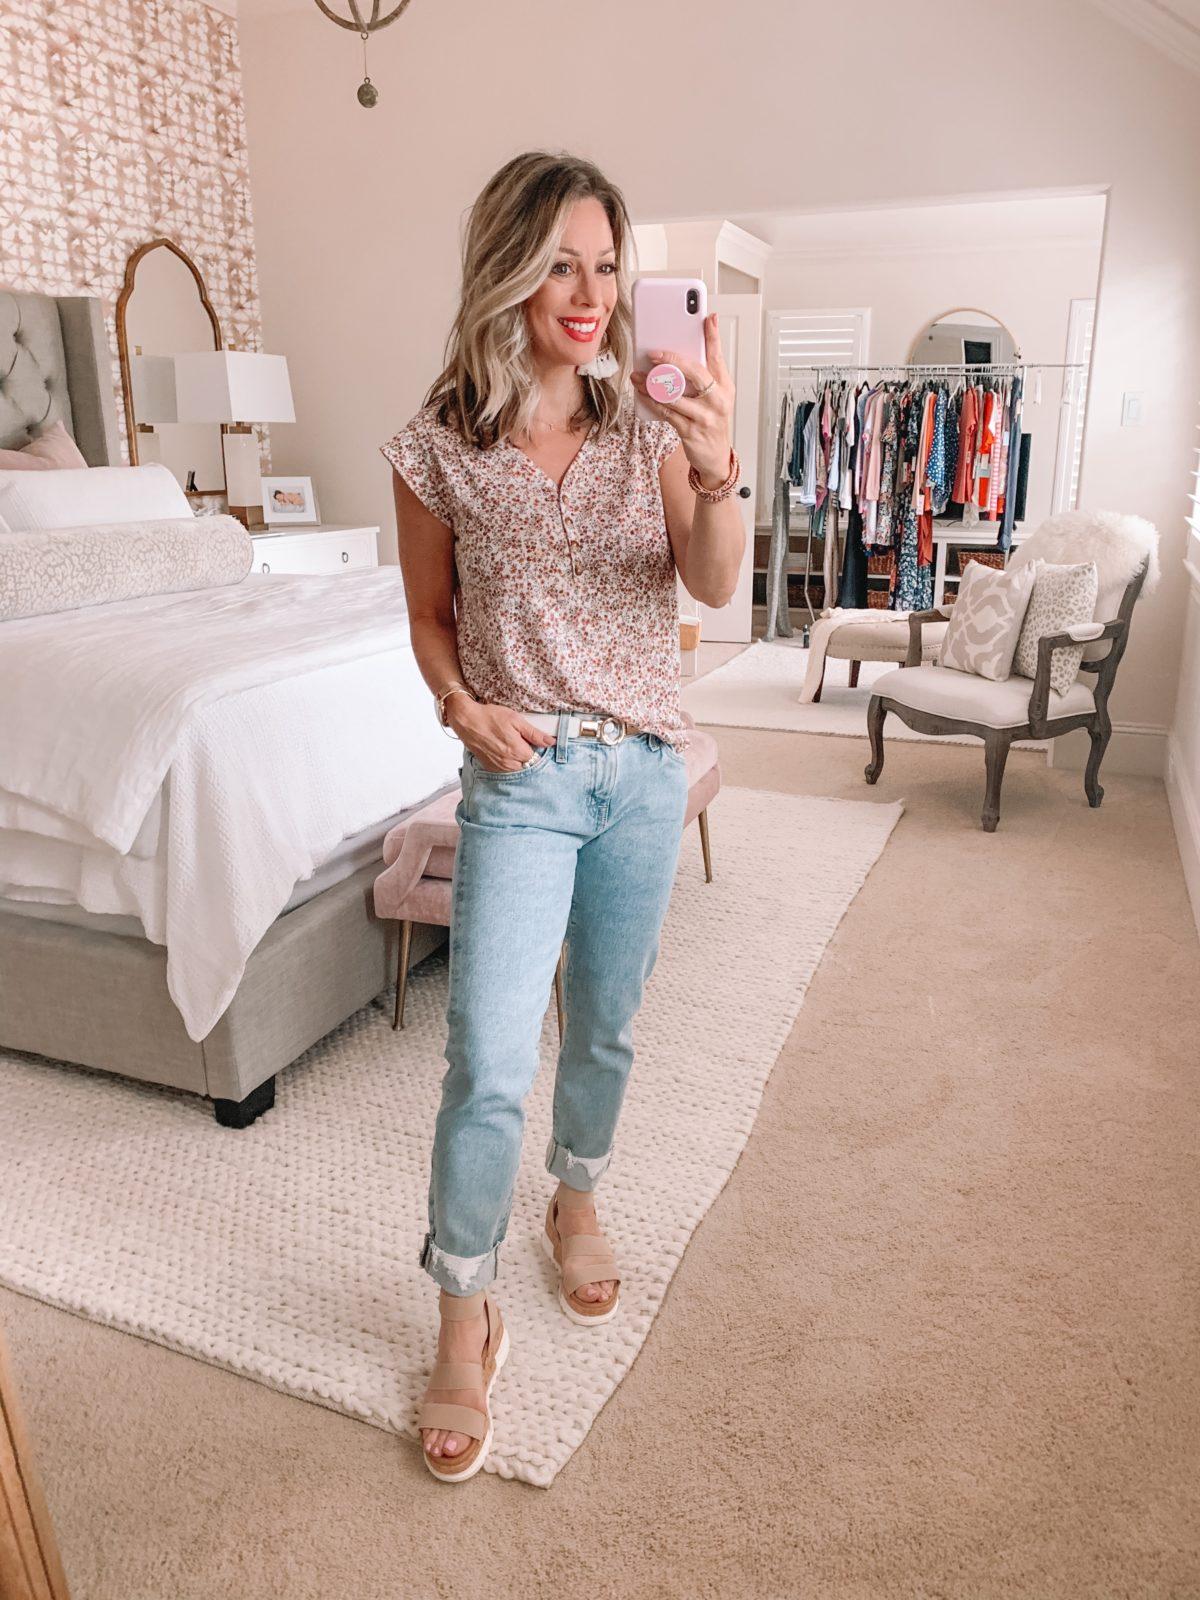 Dressing Room Nordstrom & LOFT, Floral Henley Tee, Ex-Boyfriend Jeans, Platform Sandals